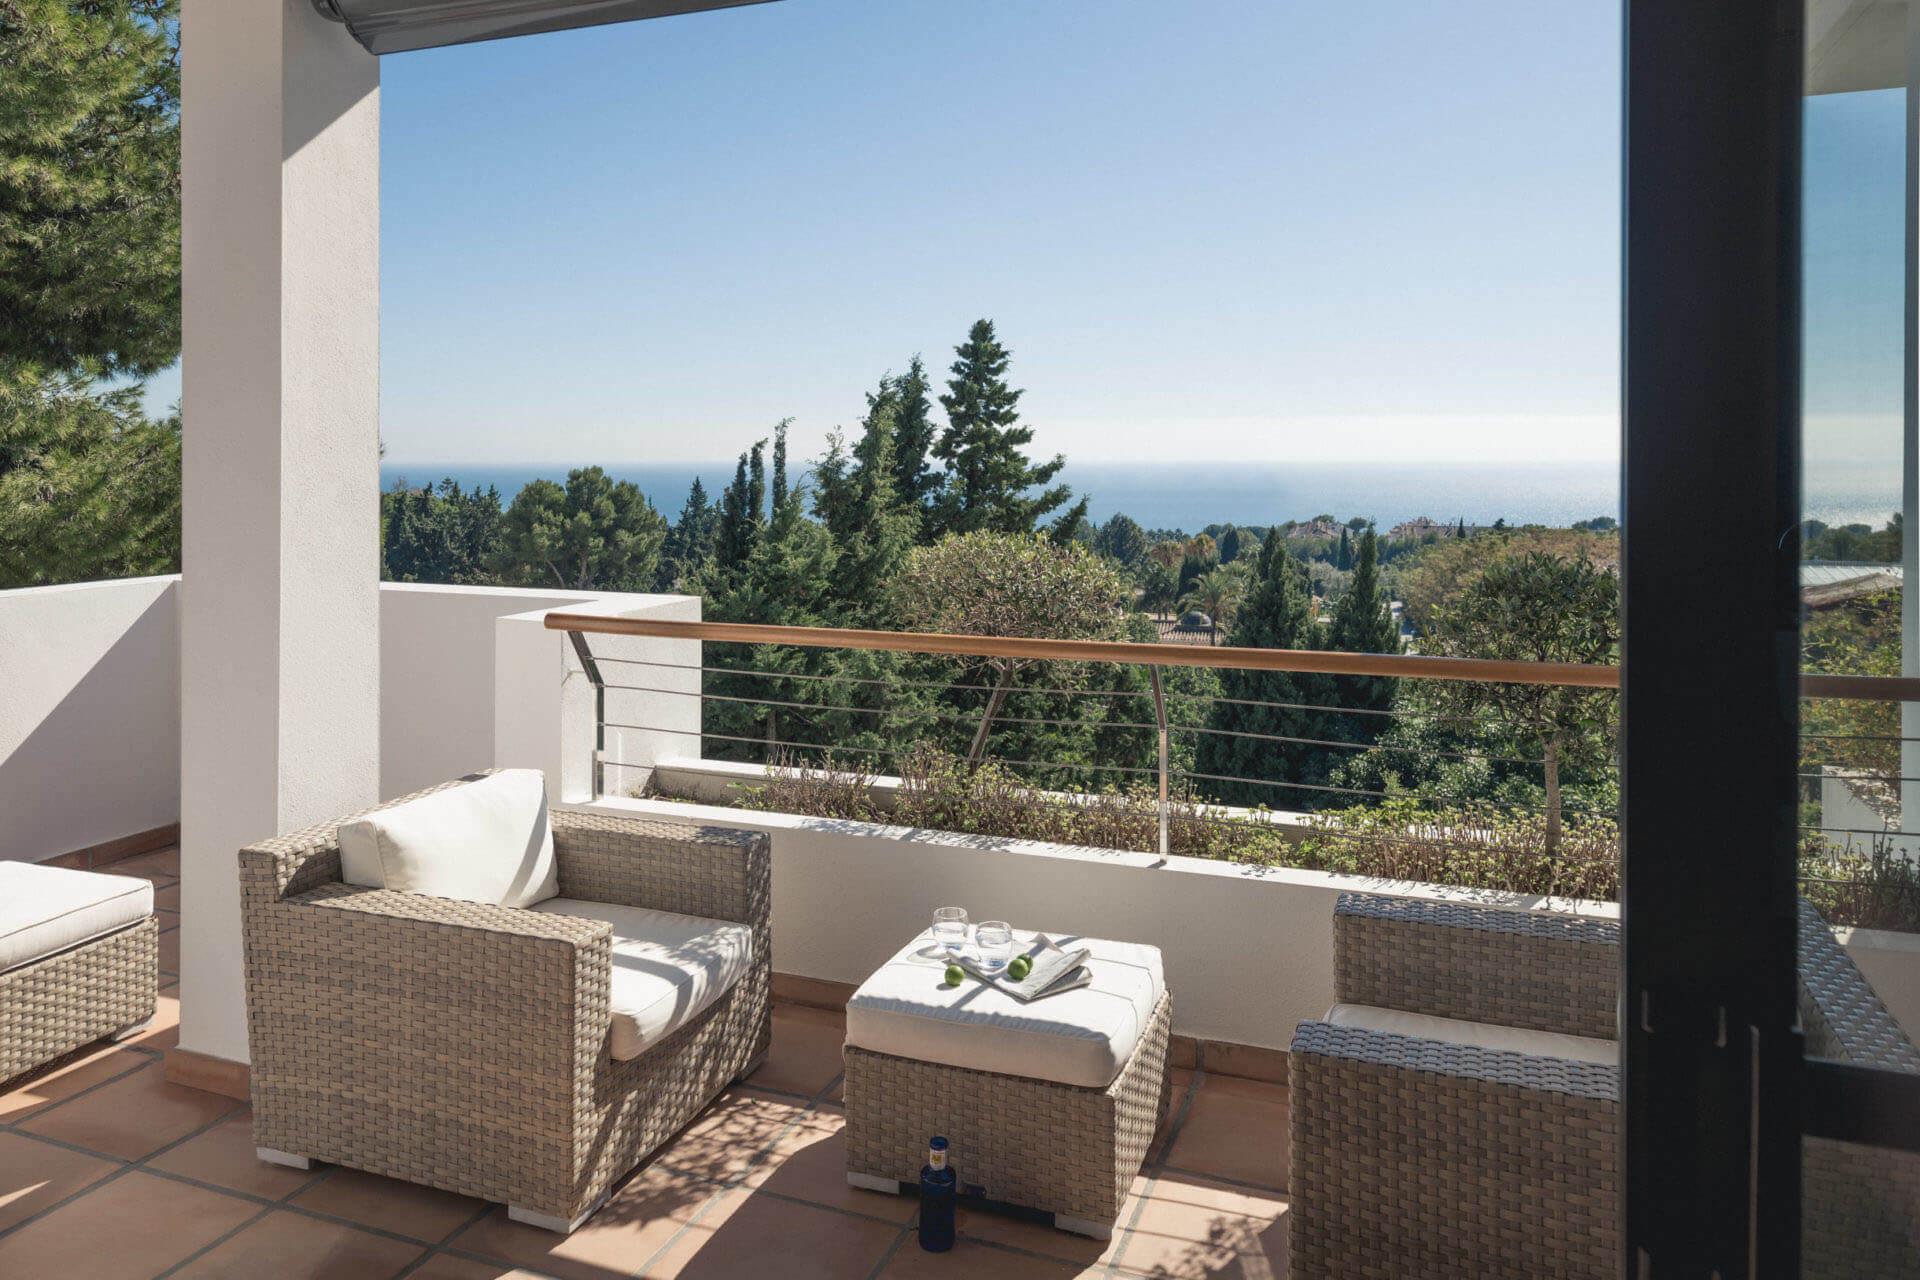 Buchinger Wilhelmi, Fasten, Heilfasten, Fasting, Health, Integrative Medicine, Suite Bella Vista Balcony, Marbella, Andalusia